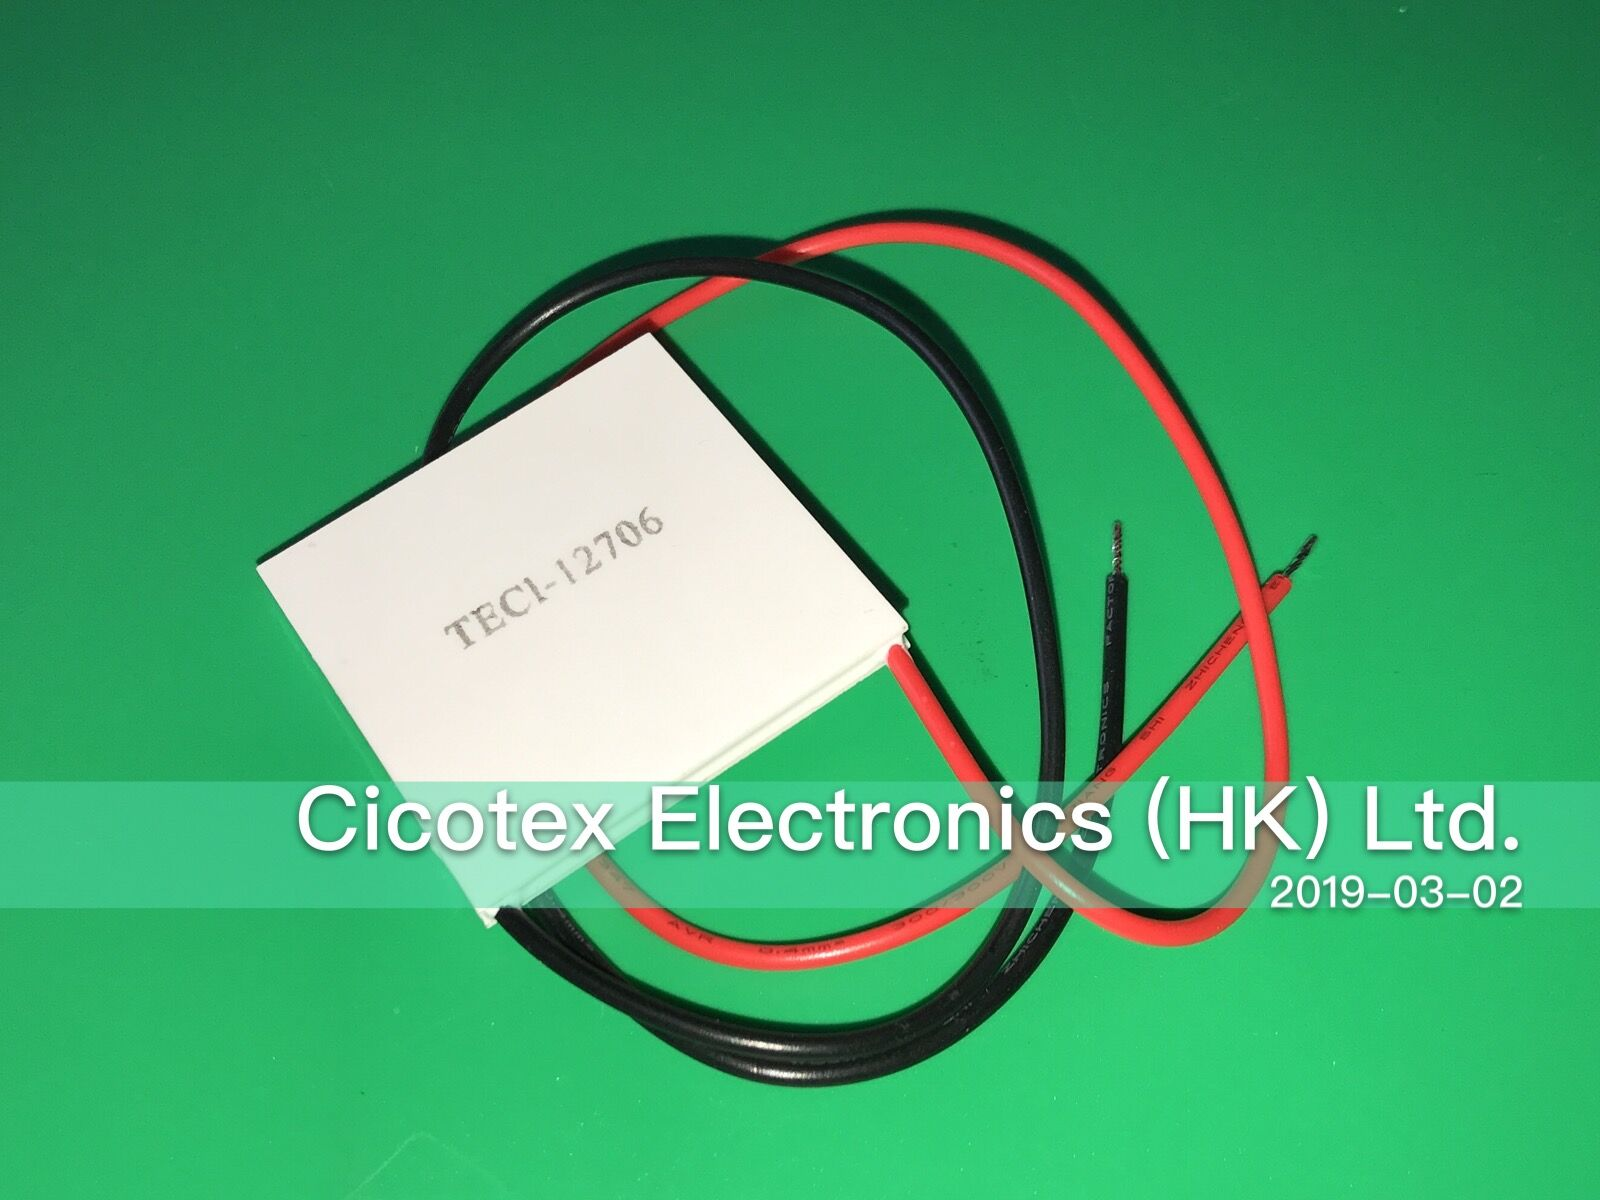 Superior to TEC1-12706 TEC1-12715 High Power Peltier Cooler 12705